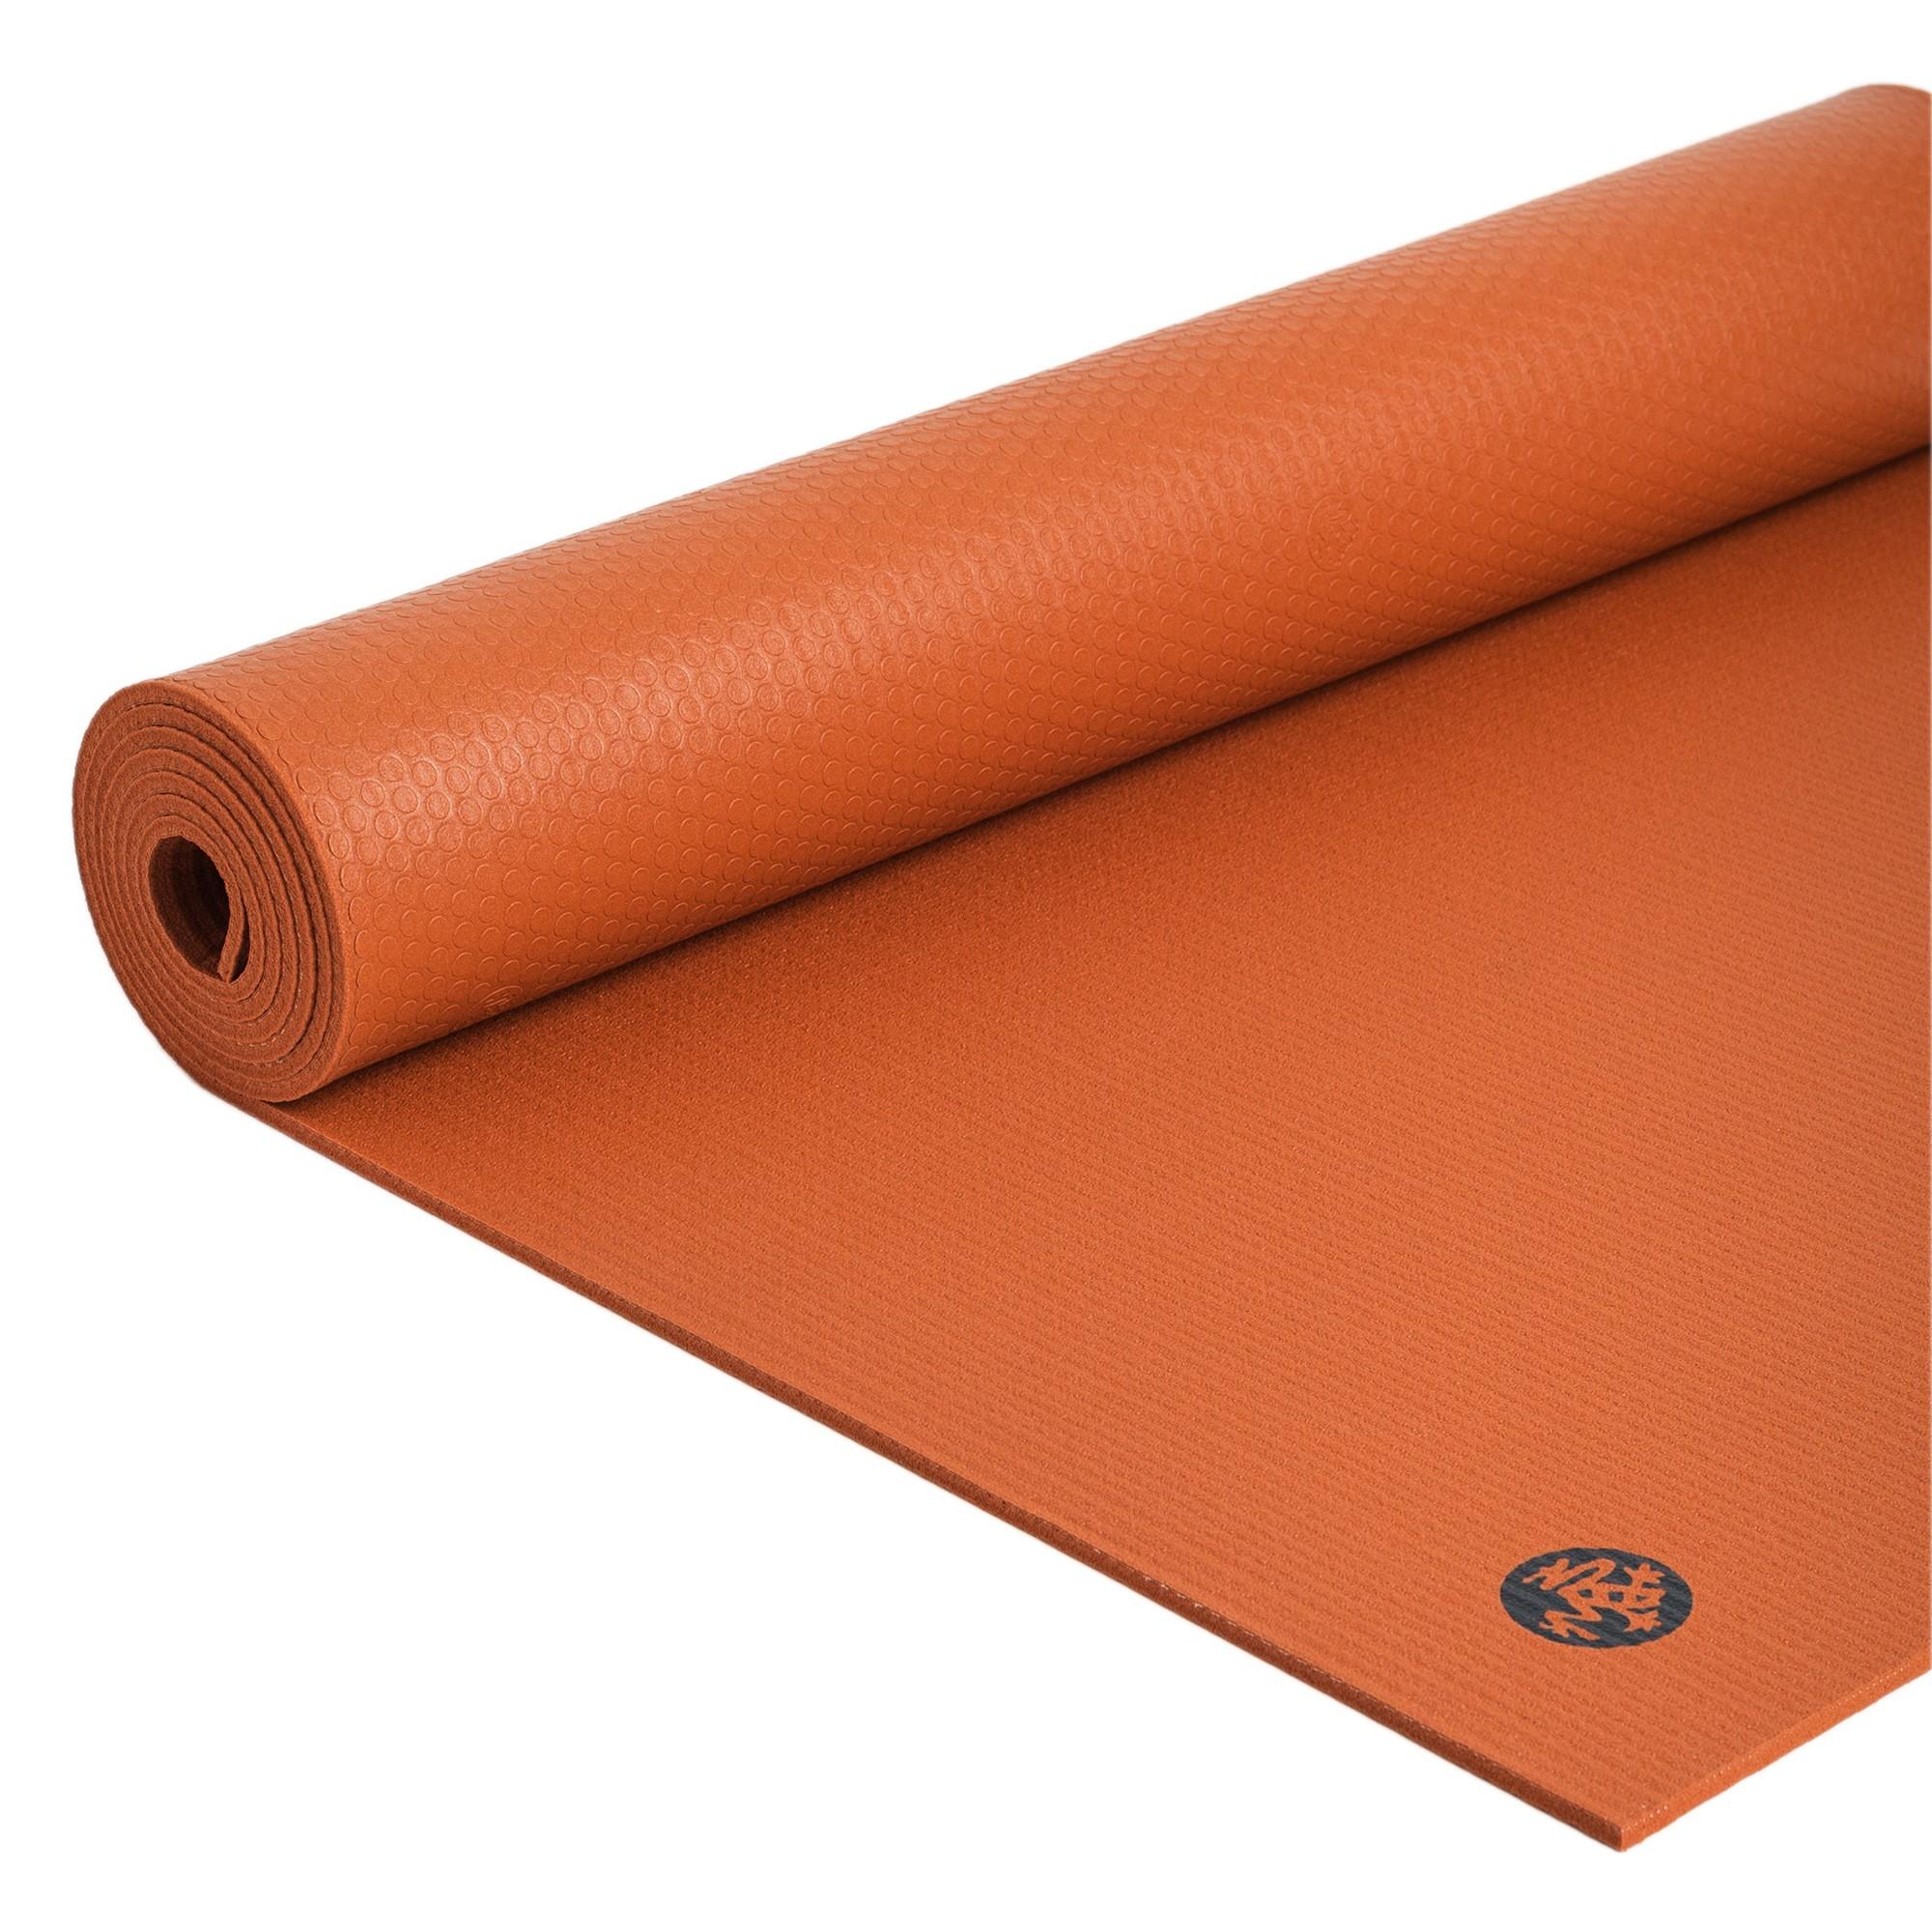 towel x best youphoria for mats microfiber gym slip mat yoga amazon customerpicks non towels com